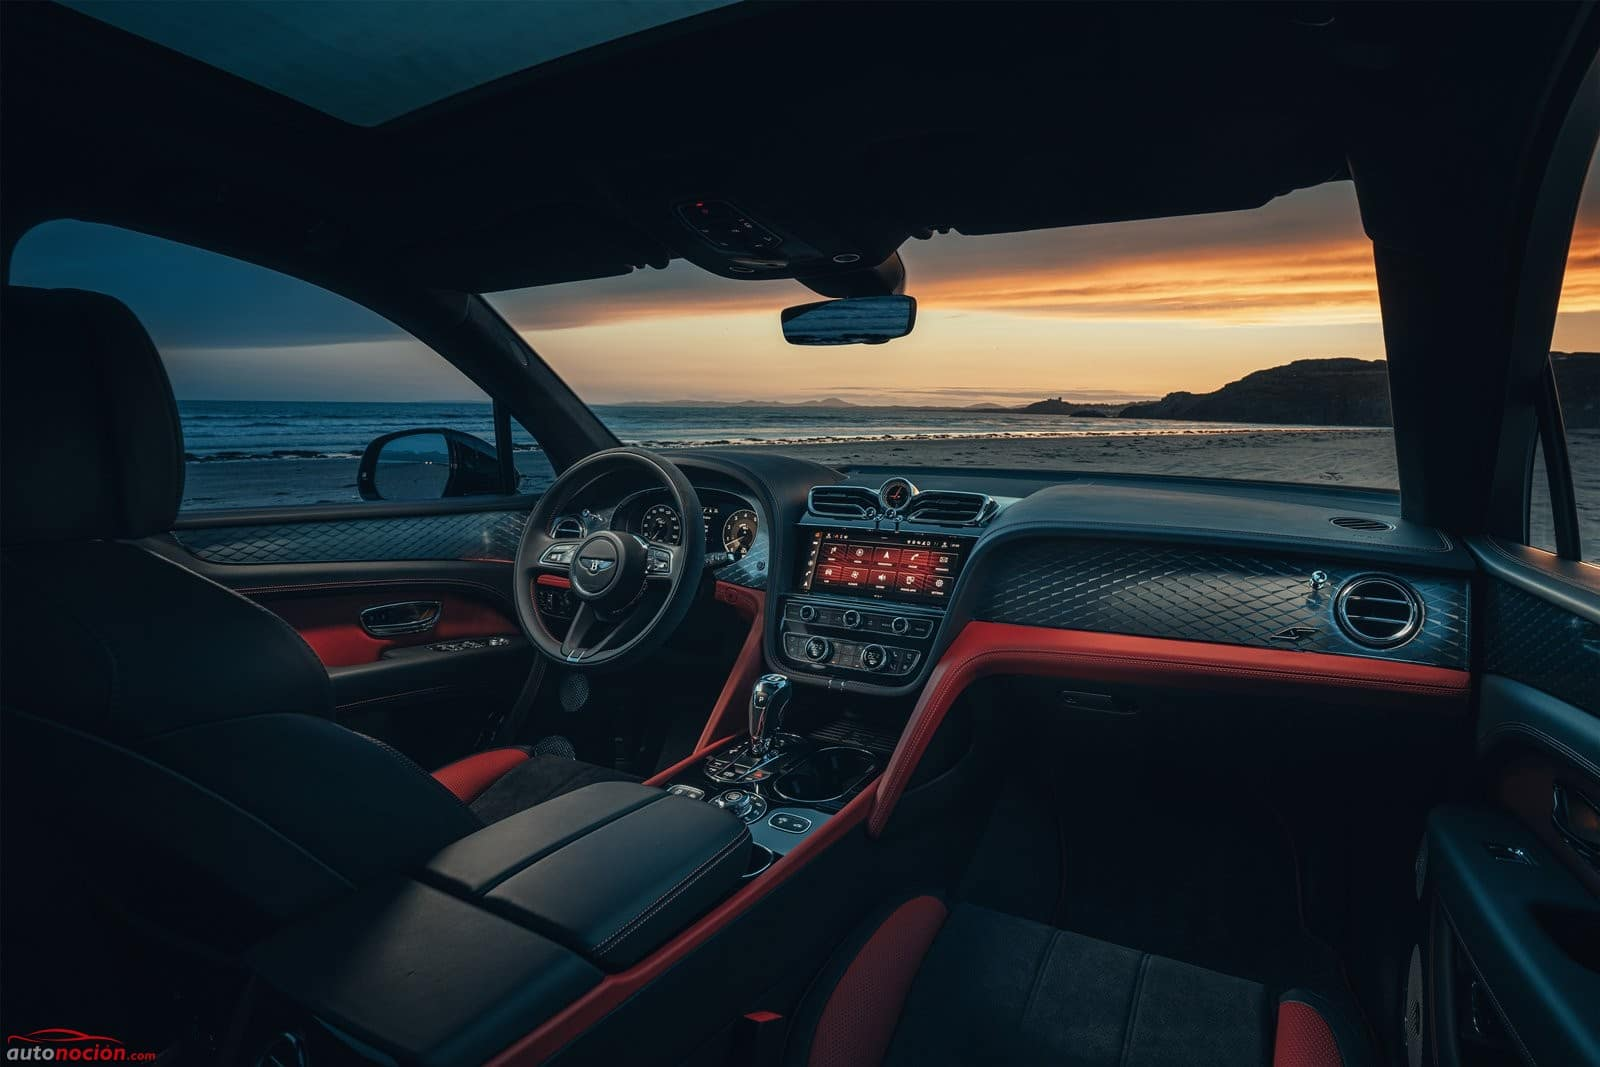 Bentley Bentayga S interior